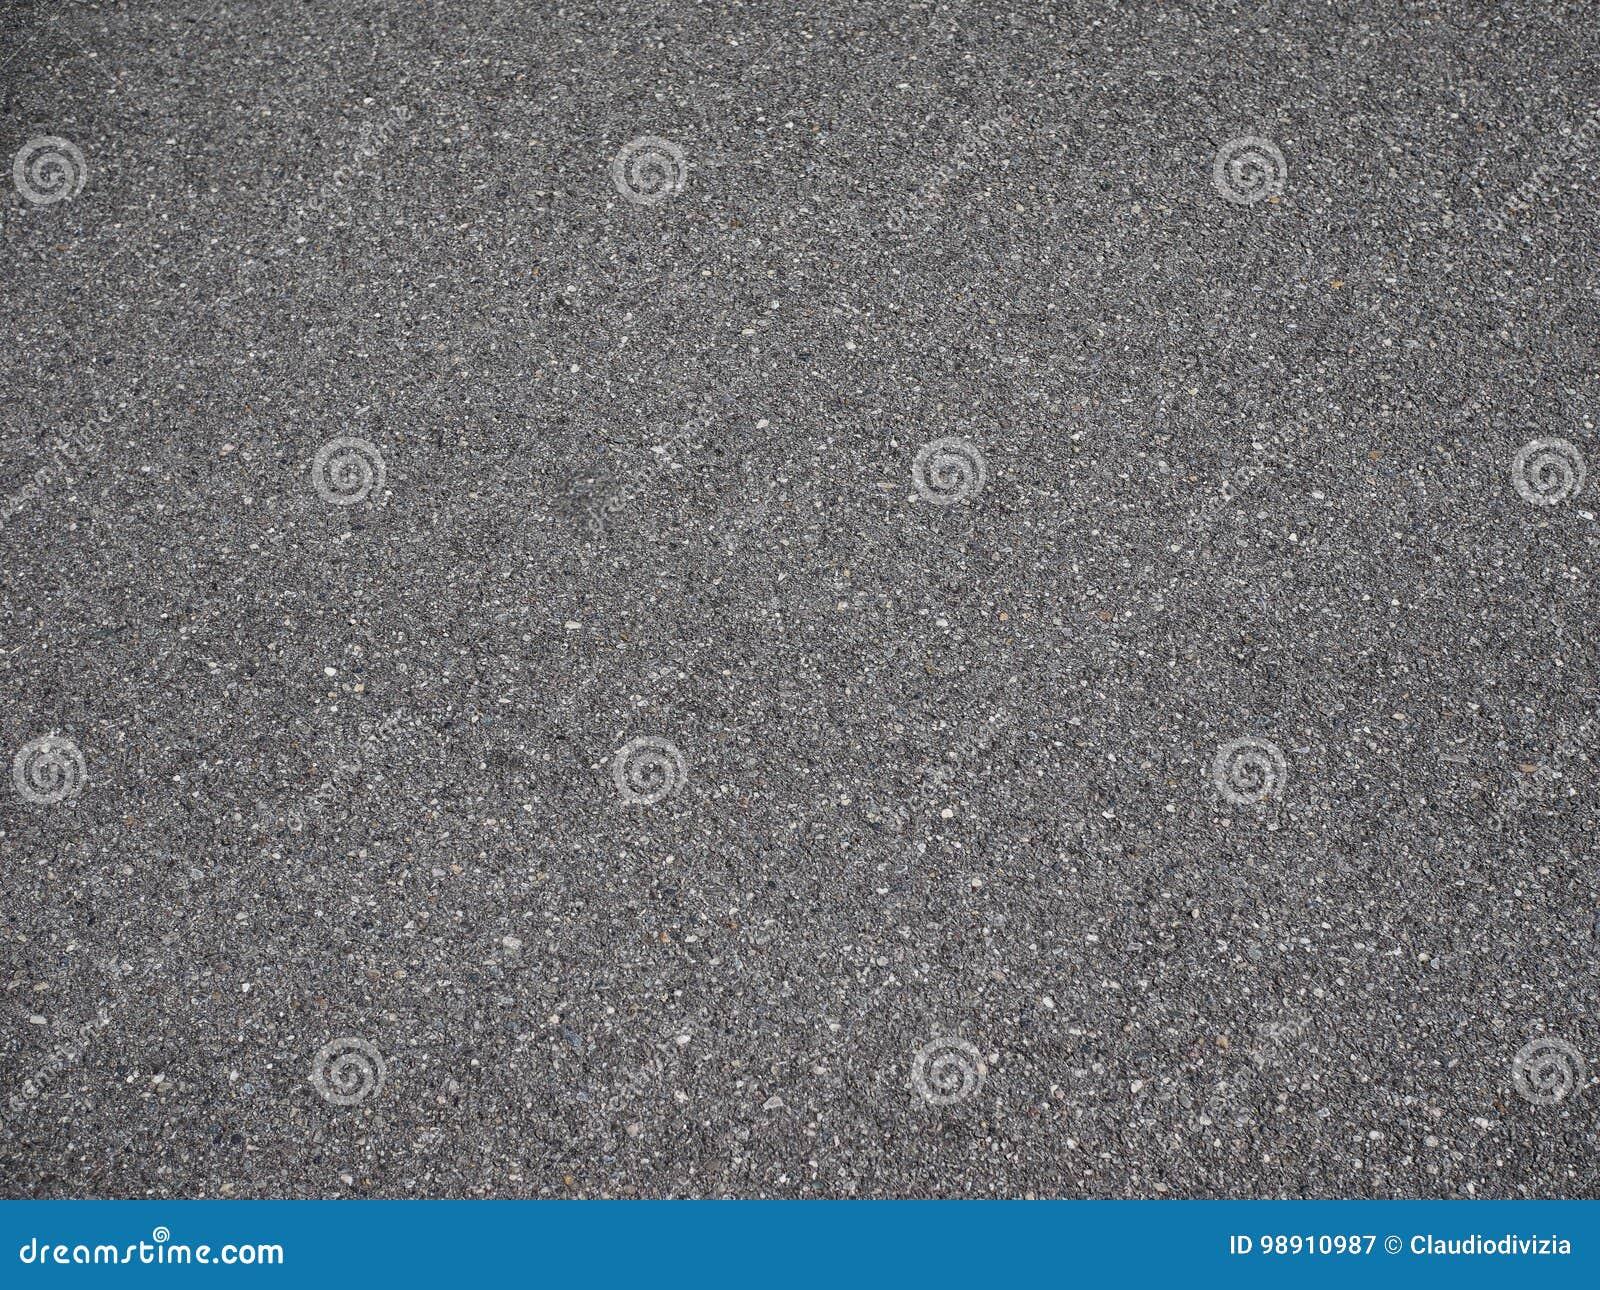 black tarmac texture background